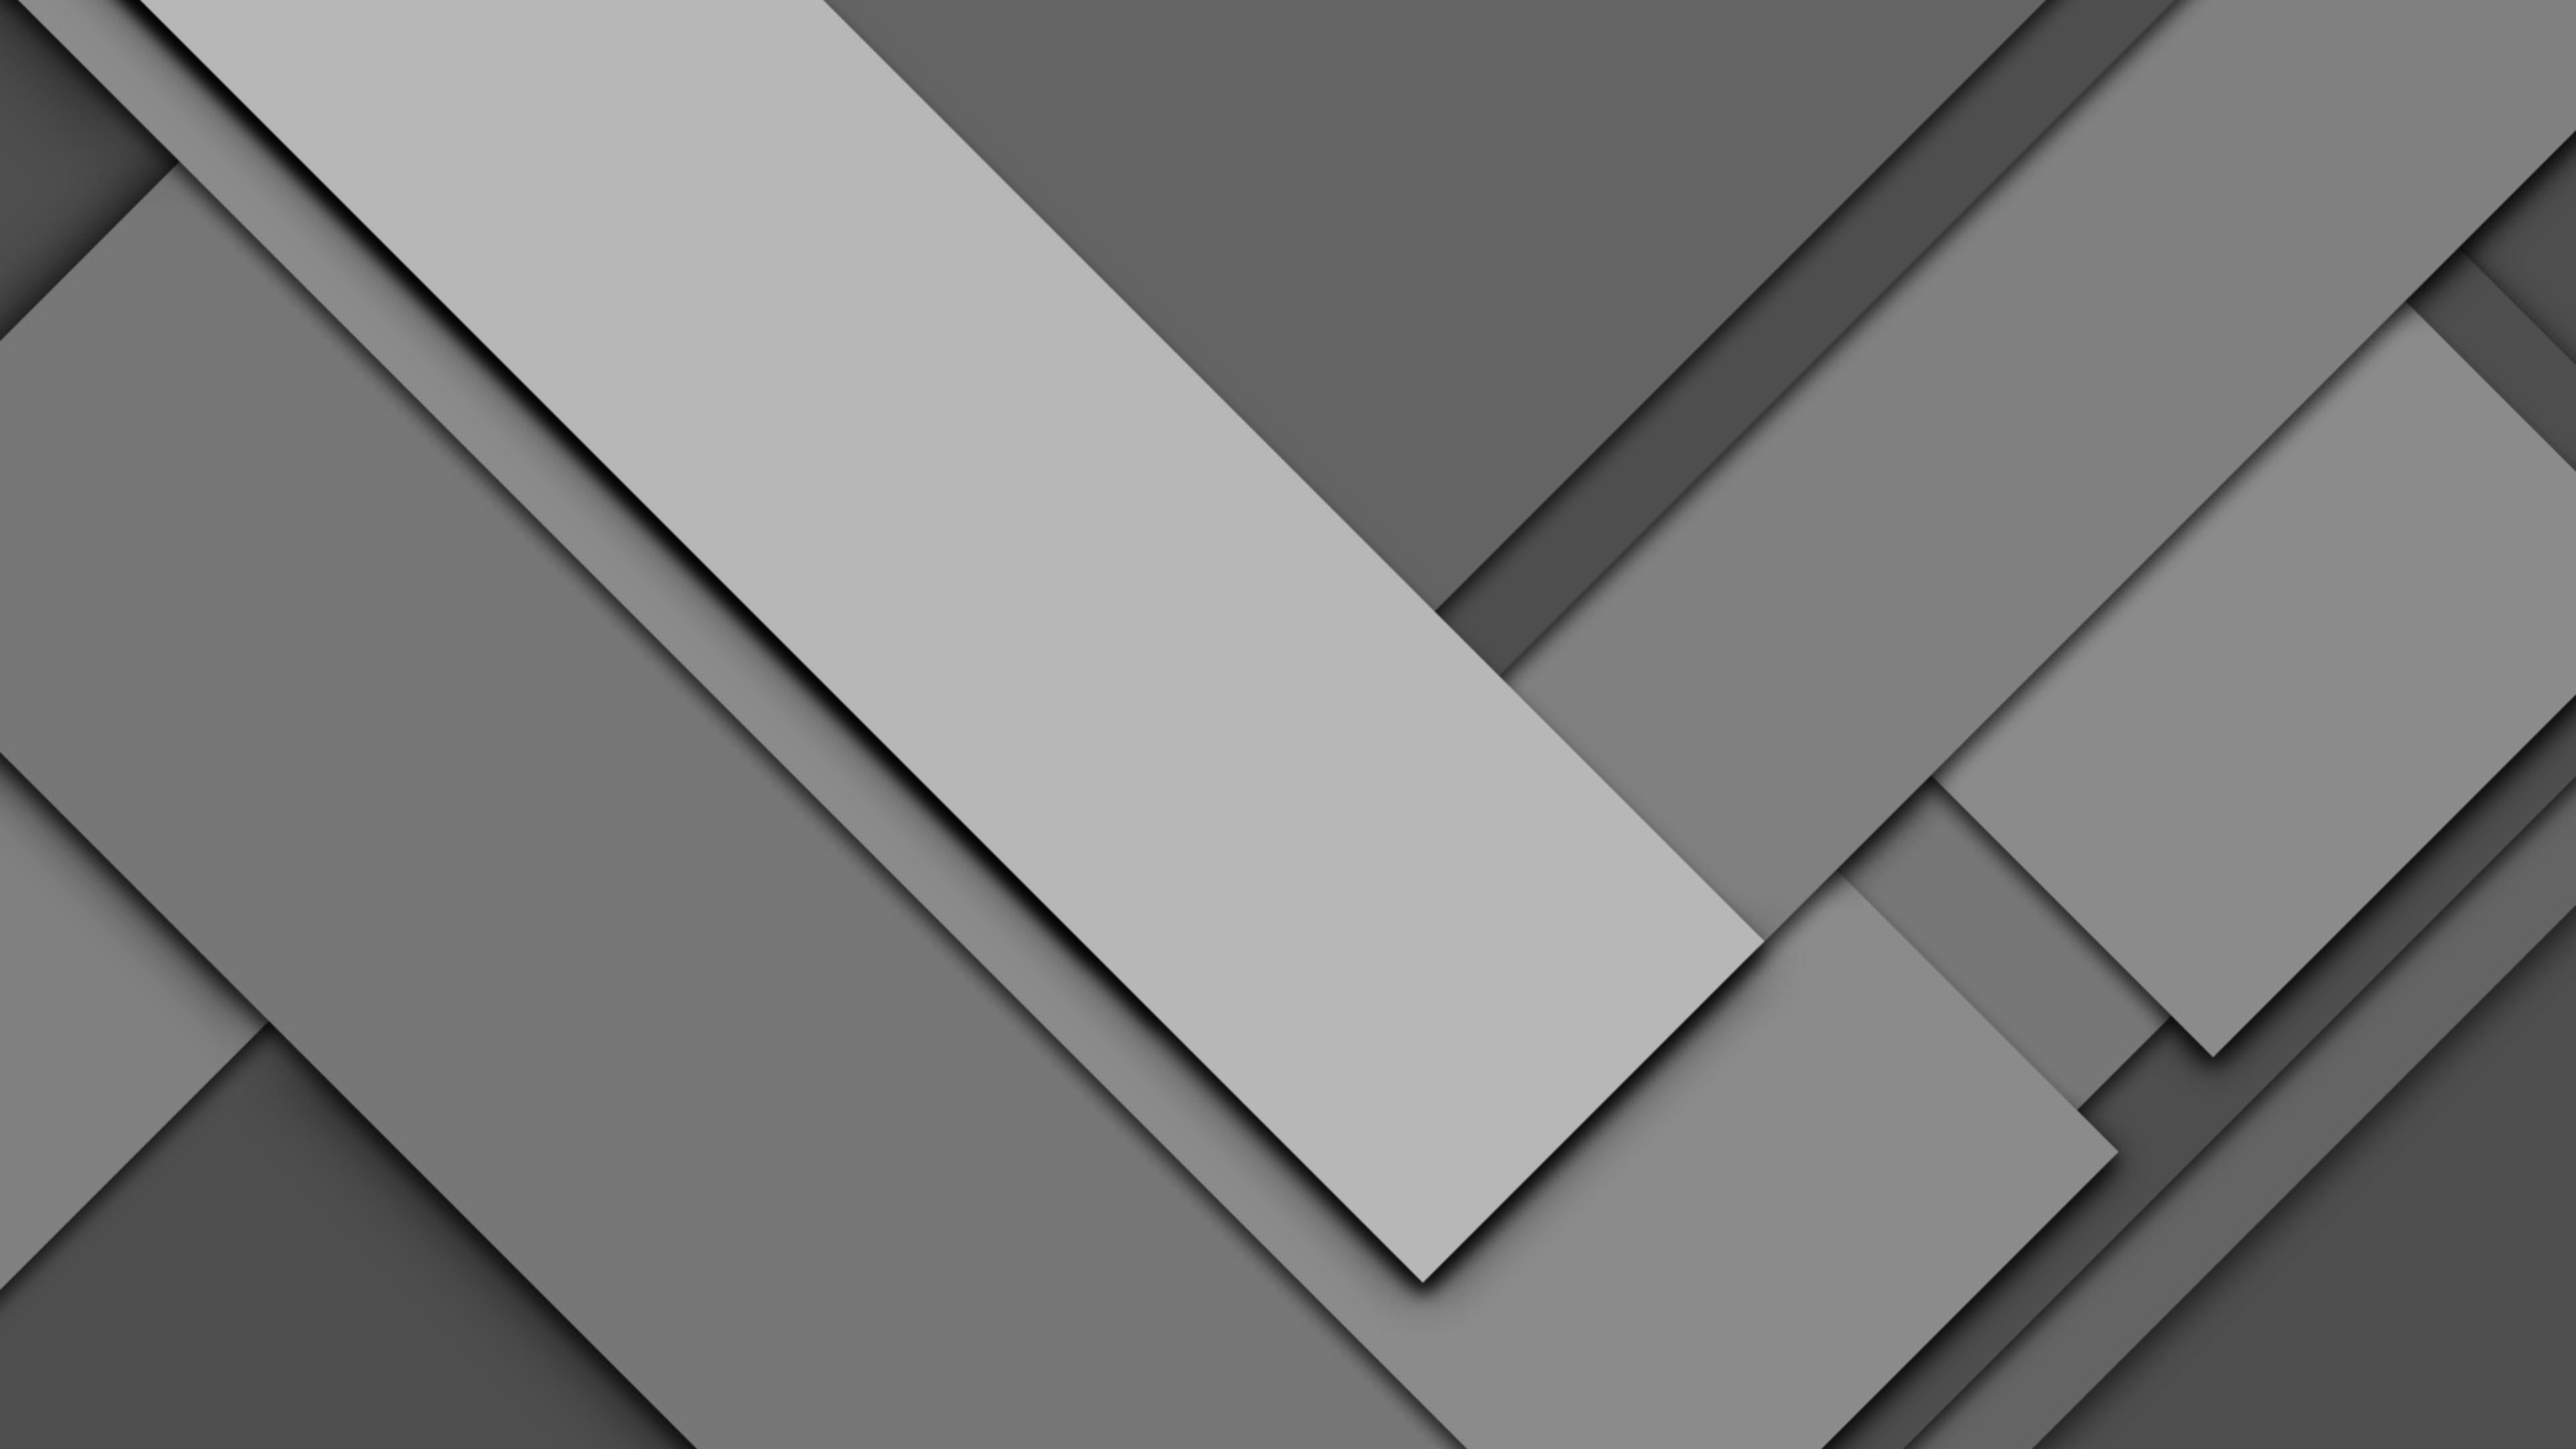 Material Design Design Minimalist Minimal Artistic Grey Graphic Design Minimal Art Angle Line 4 In 2020 Material Design Minimalist Wallpaper Designer Wallpaper